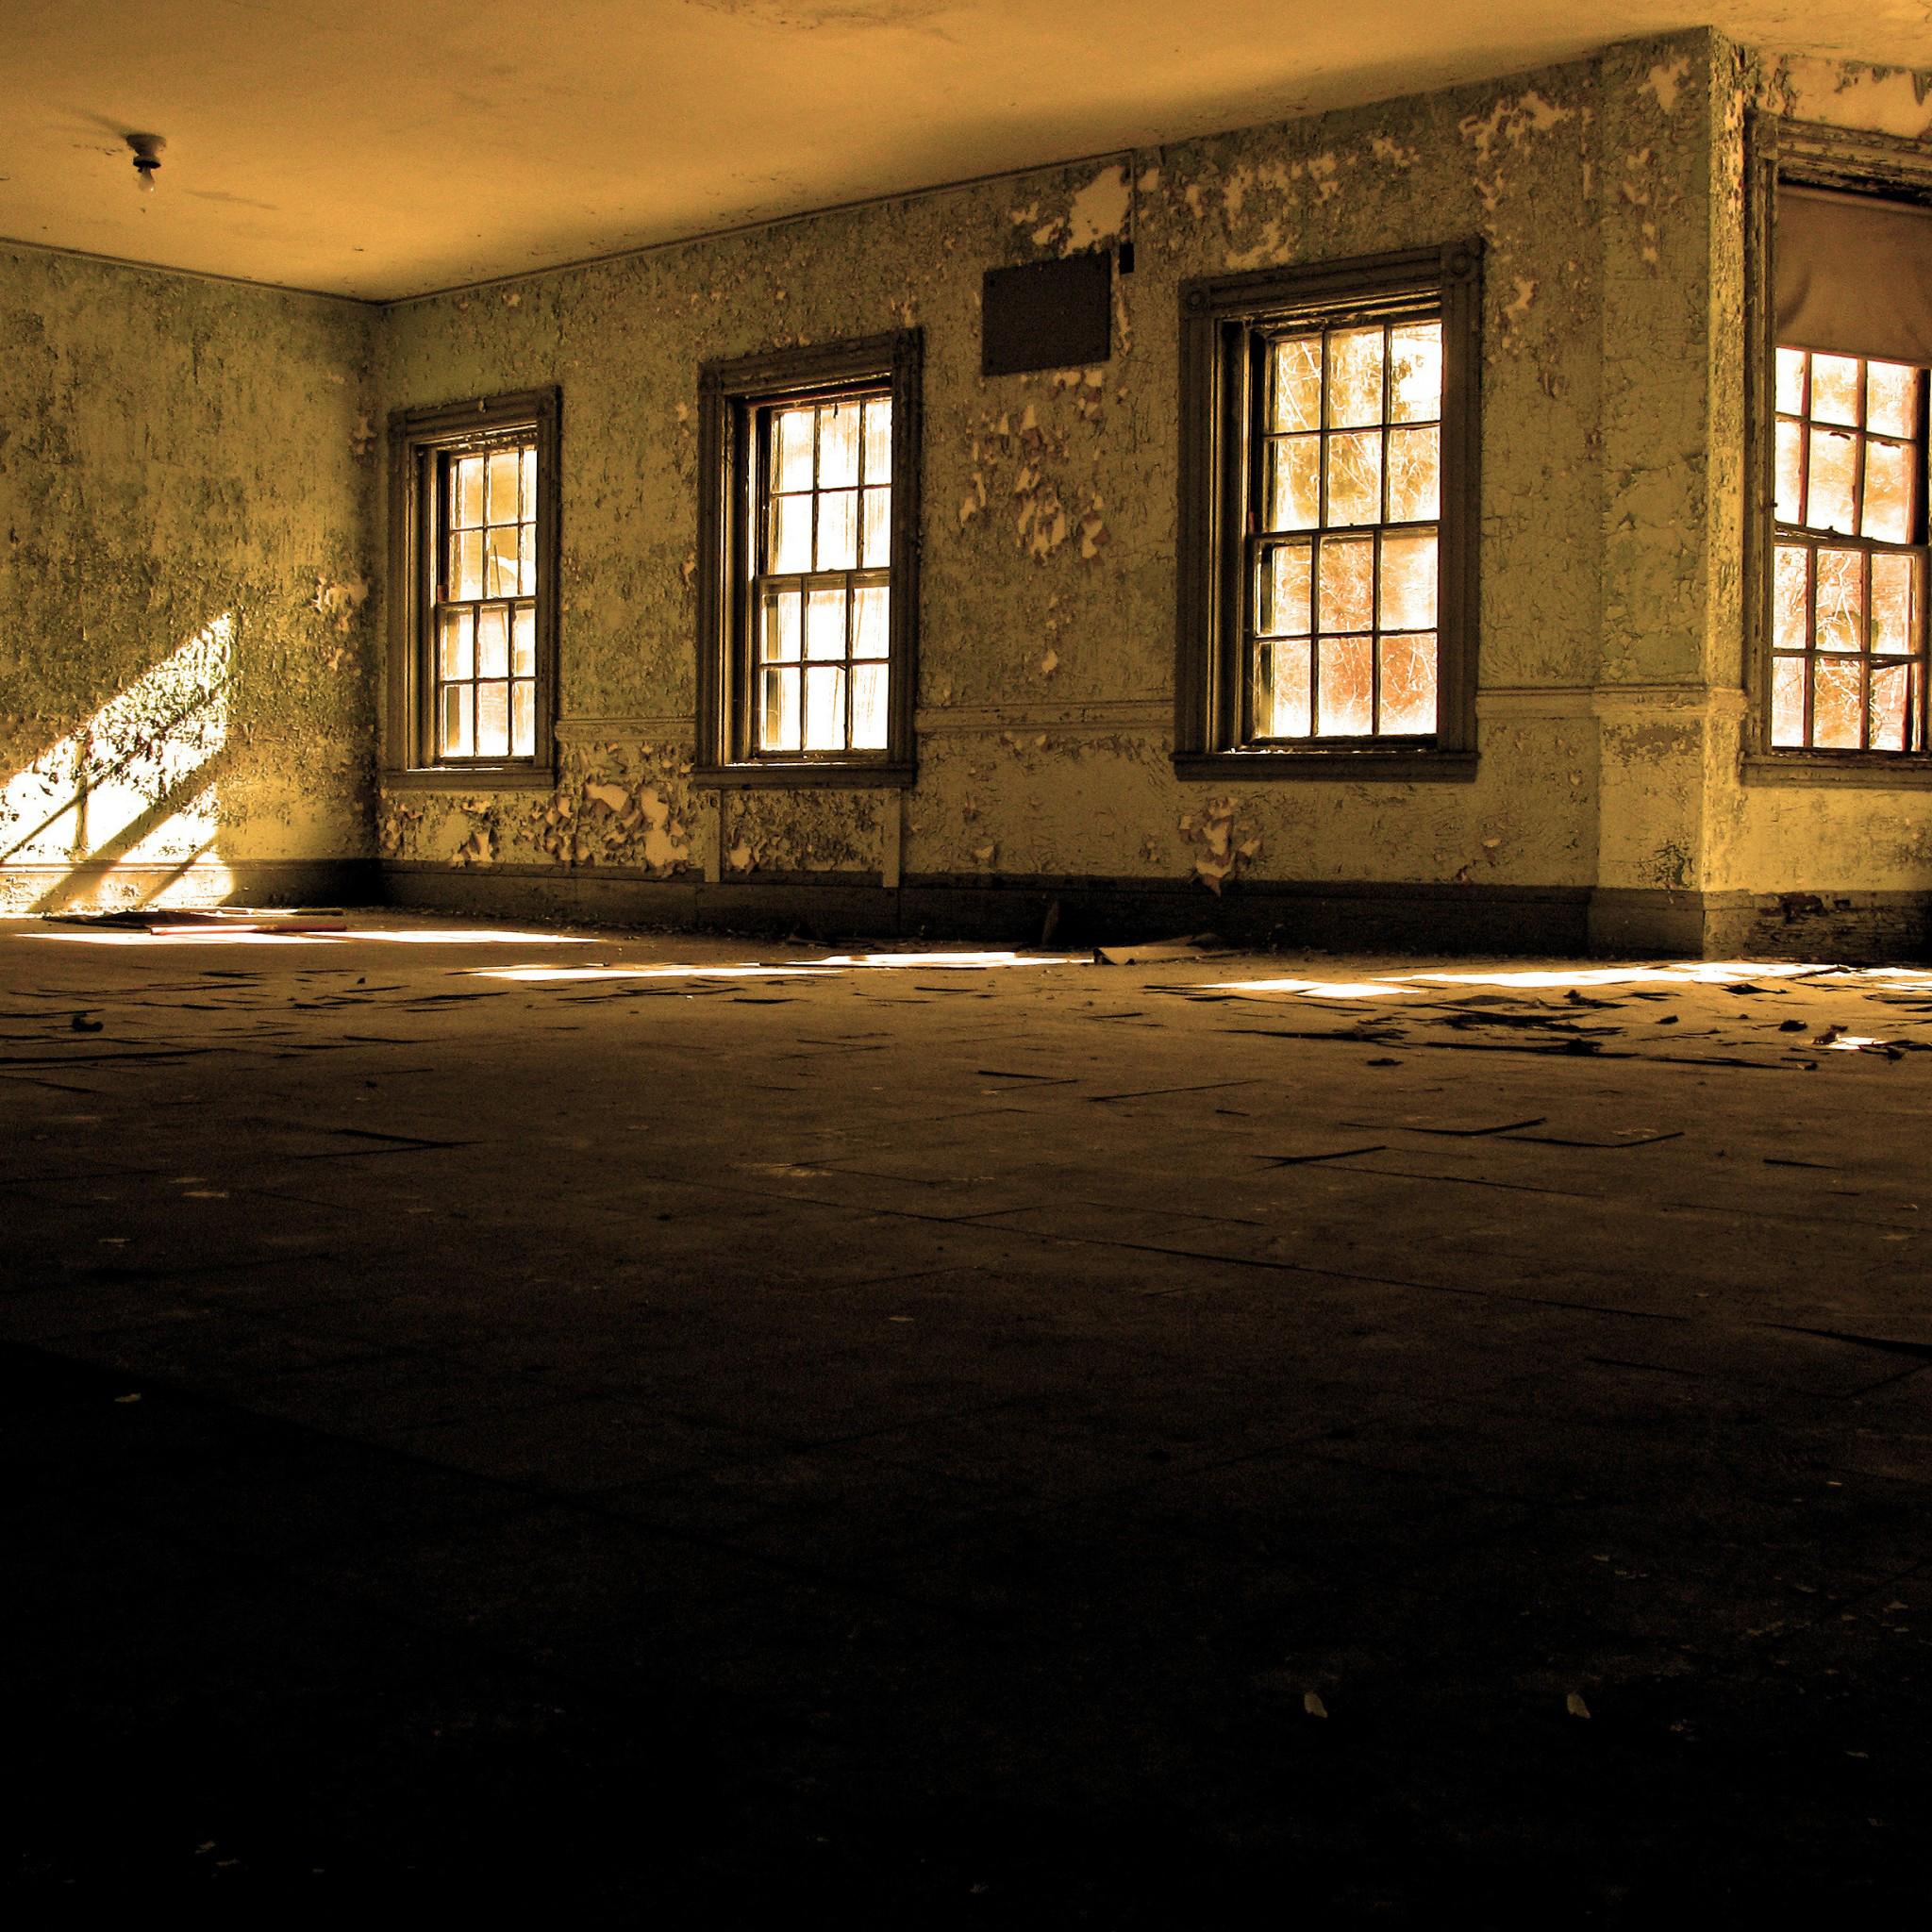 Room-Inside-Sunlight-3Wallpapers-iPad-Retina